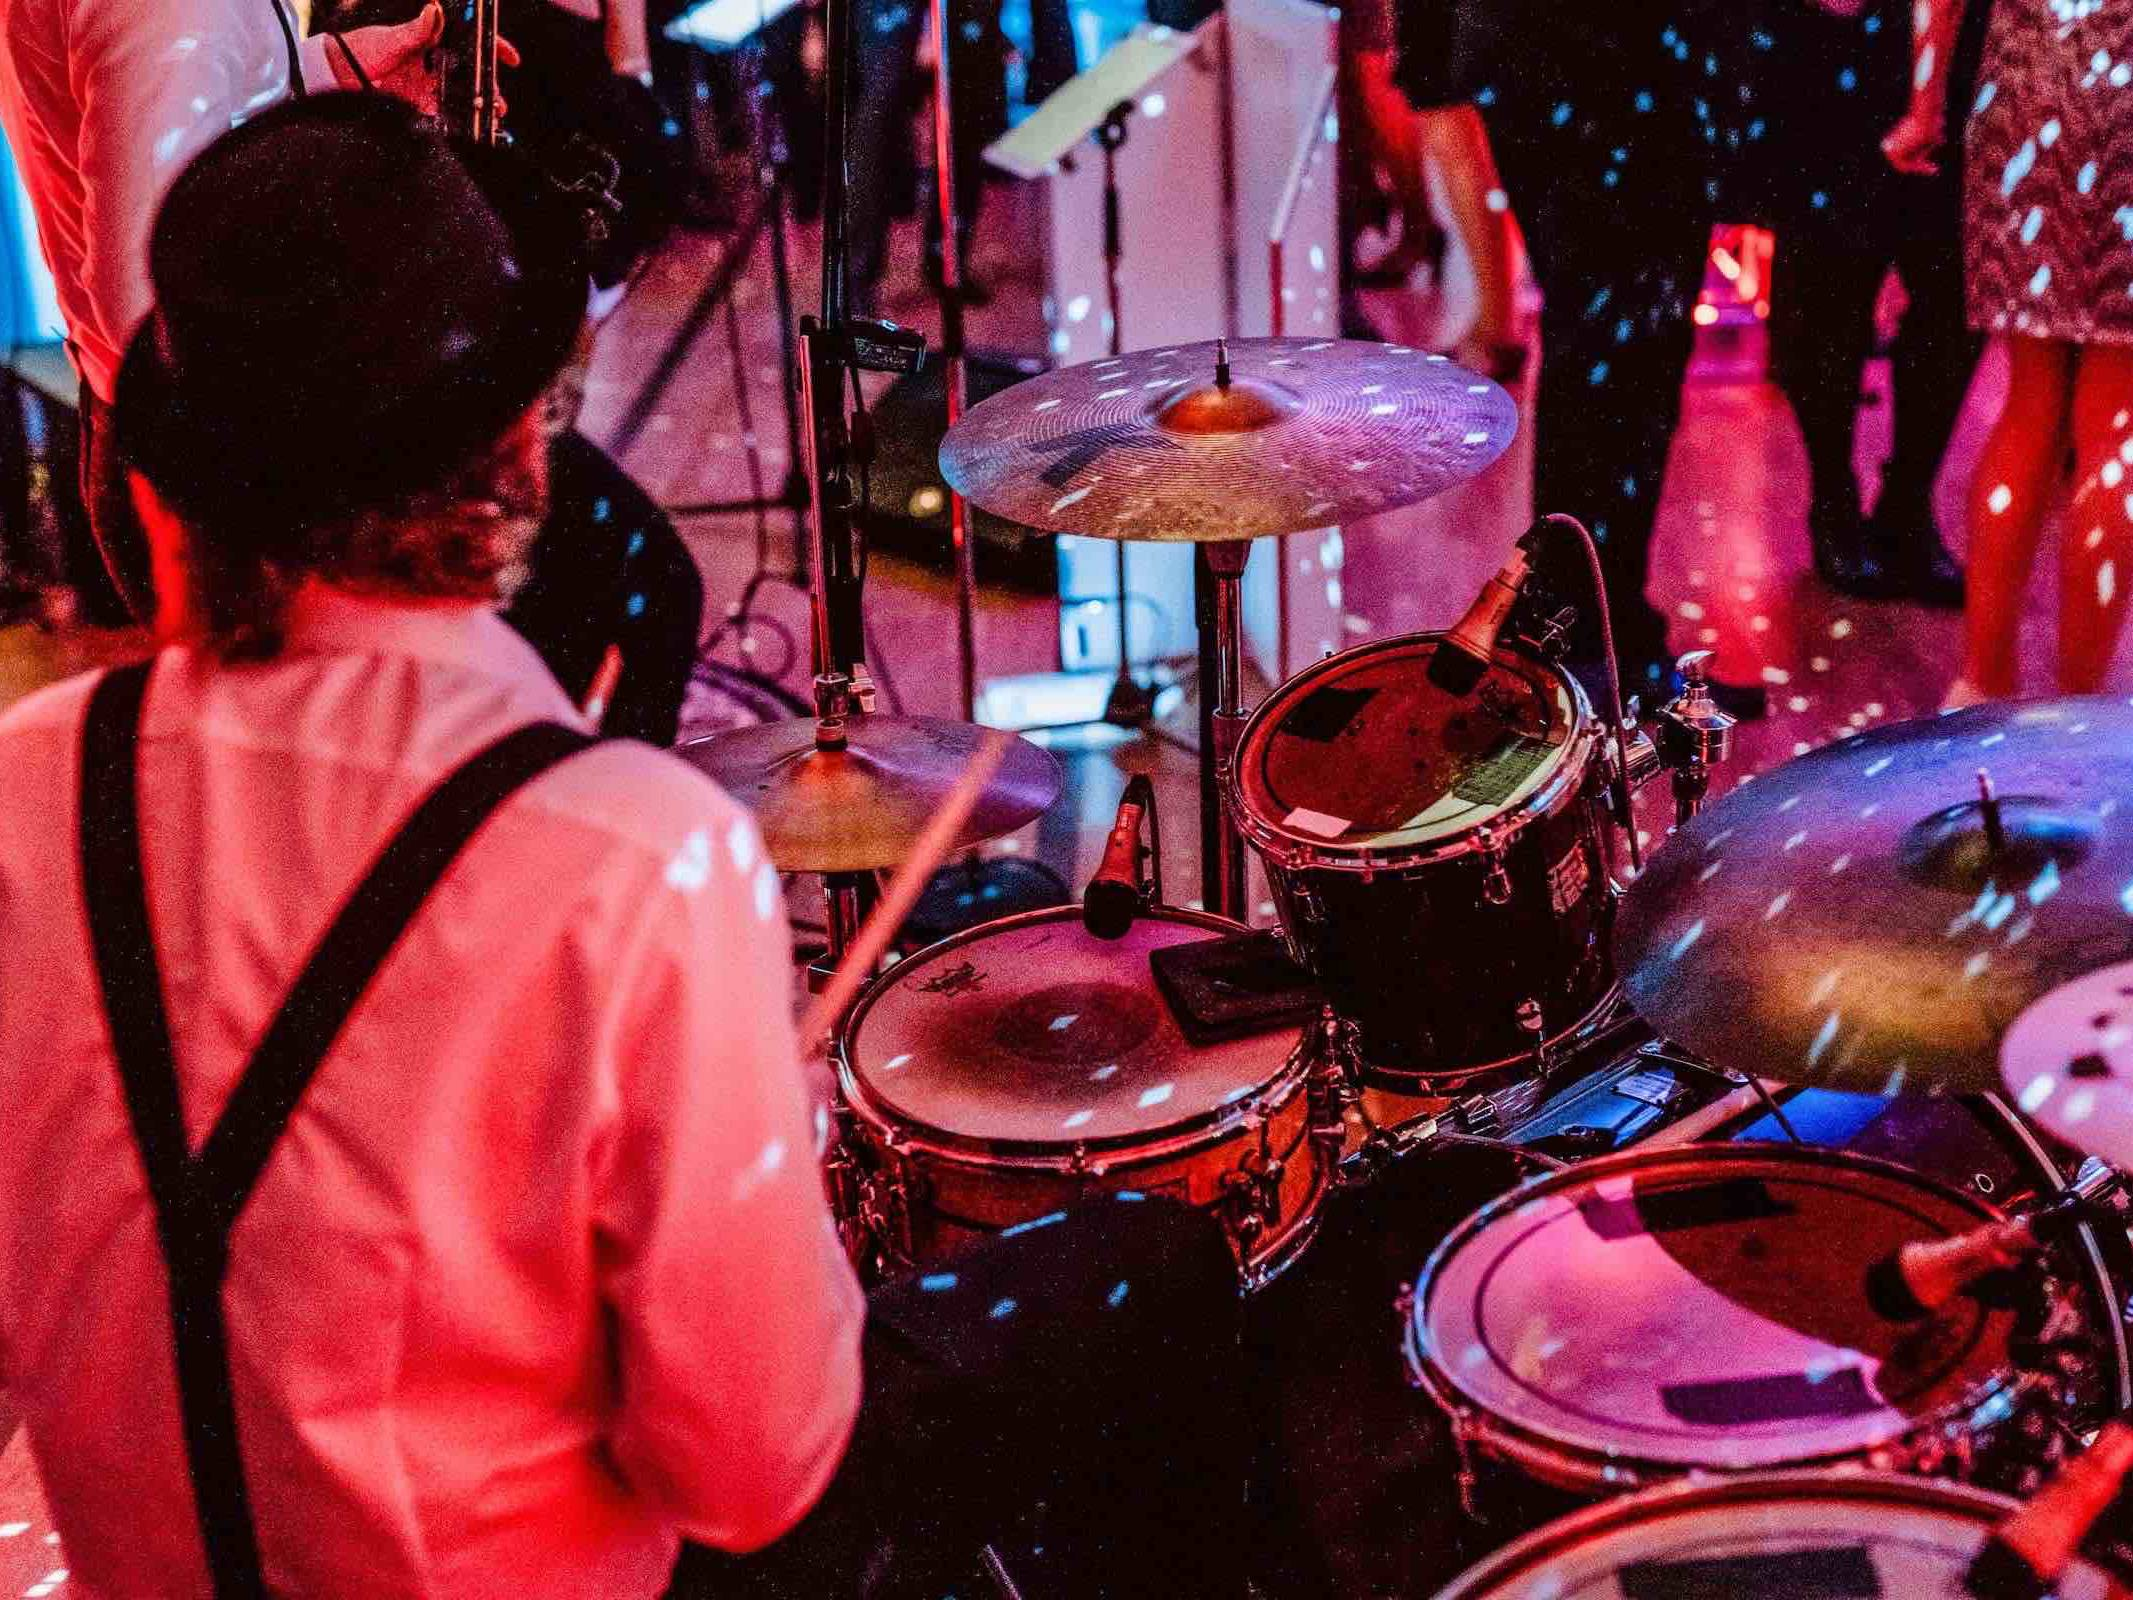 Band   Hamburg   Livemusik   Partyband   Liveband   Swingband   Team   Hochzeitsmesse   Jazzband   Soul   Motown   Schlagzeug   Drums   Swing   Hochzeit   Firmenfeier   Dinner   Empfang   Gala   Charity   Anfragen   Hamburgfeiert